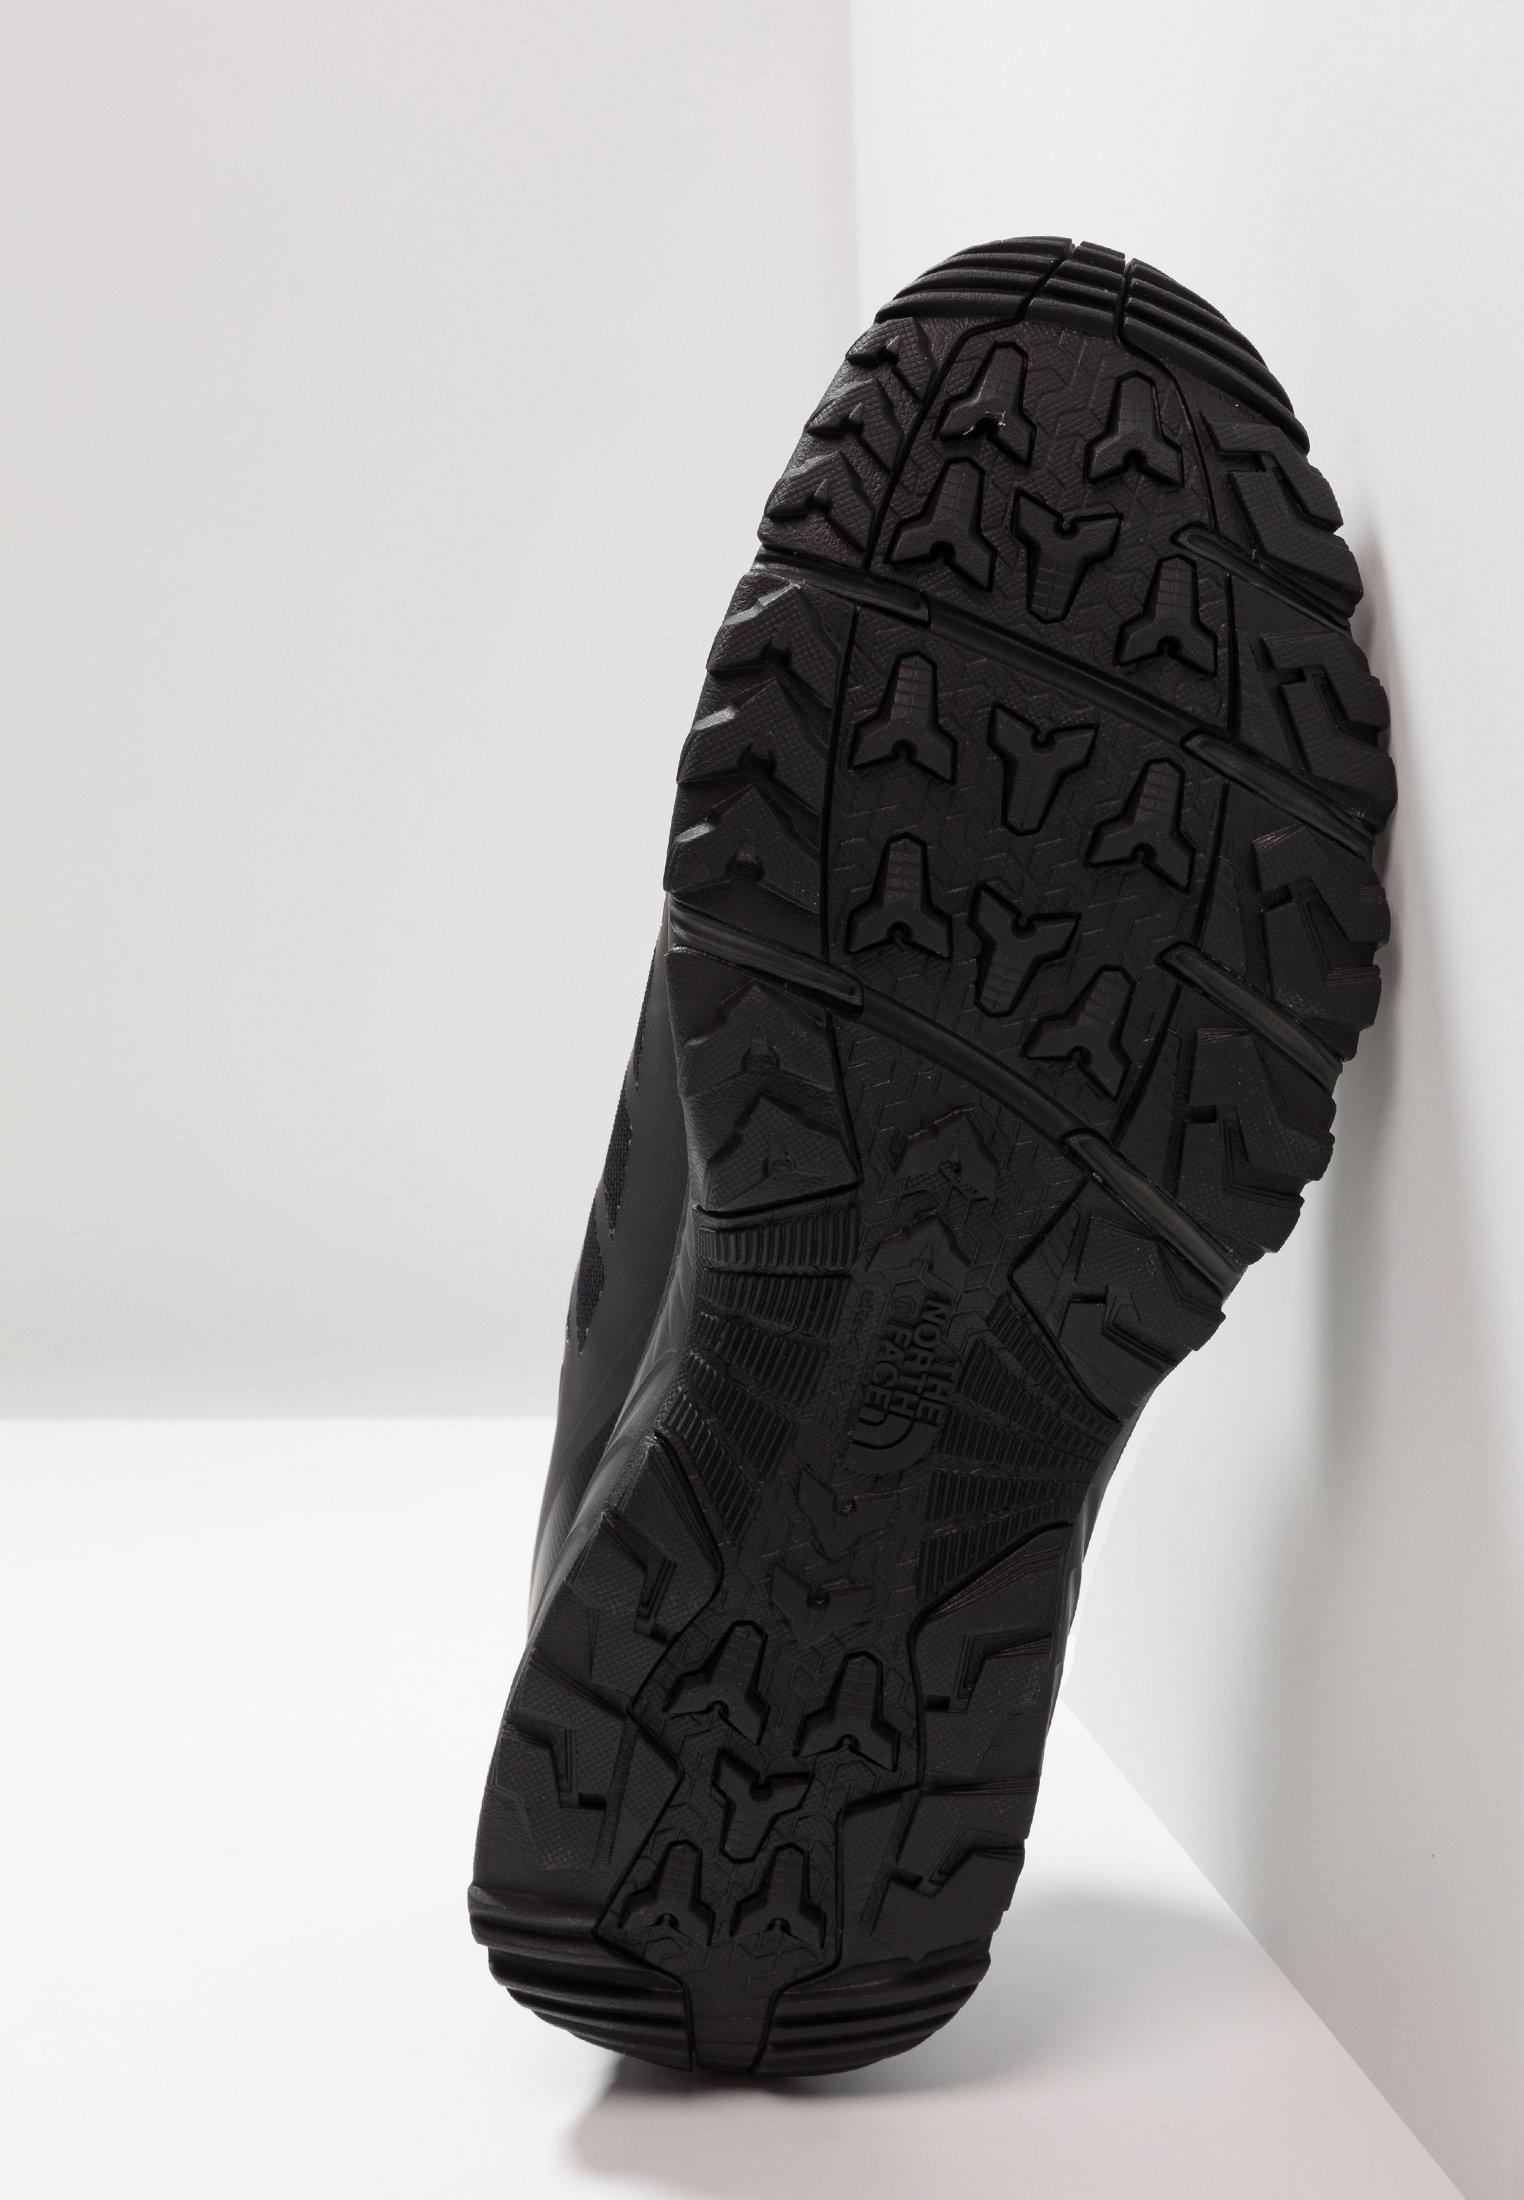 The FASTLACE GTXChaussures metallic de North Face black marche TuKF1c5Jl3